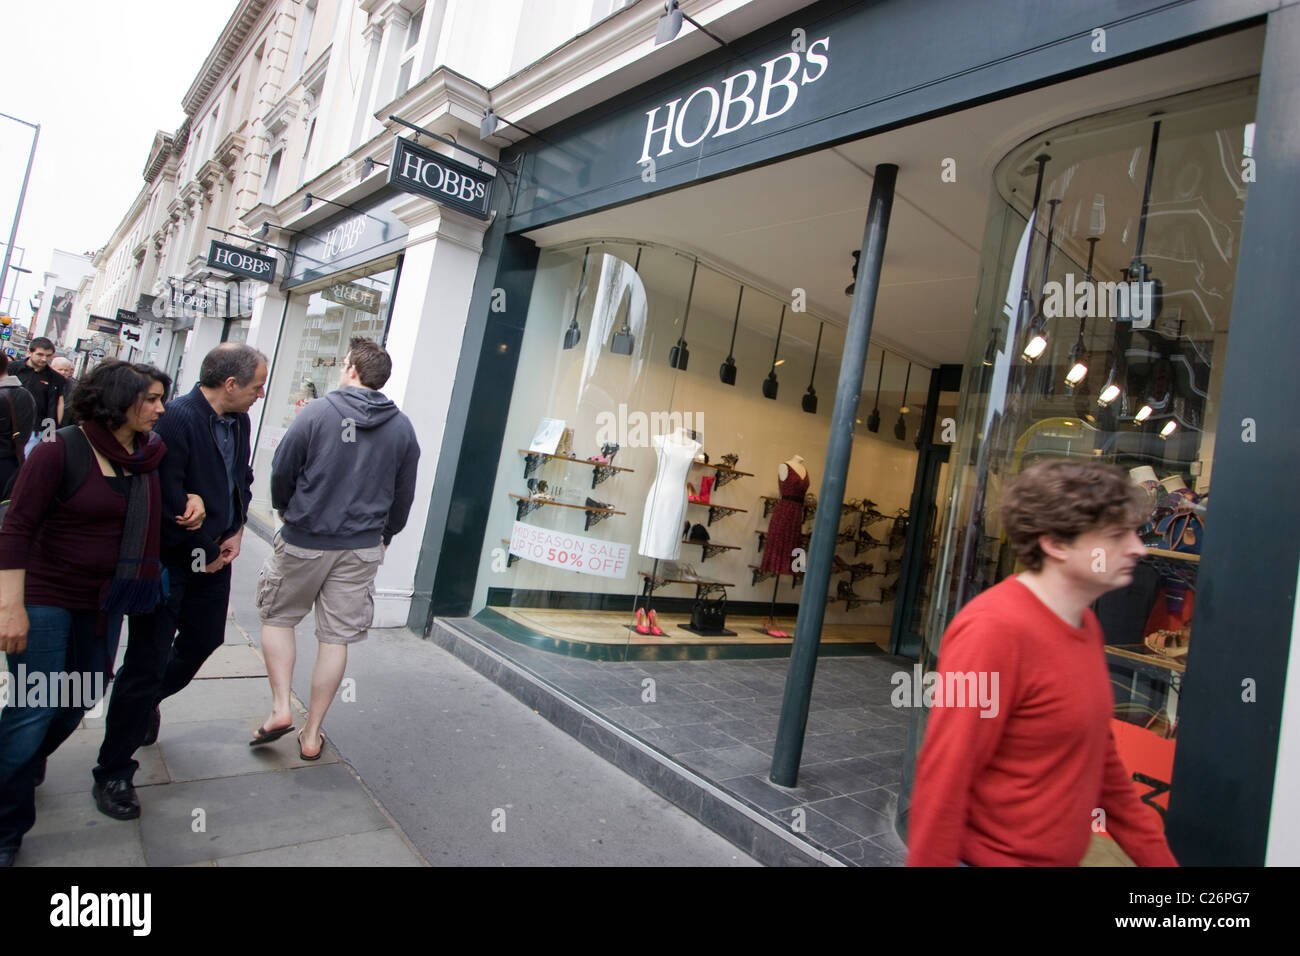 5f8742cc372f Hobbs clothing shop store Stock Photo: 35799463 - Alamy